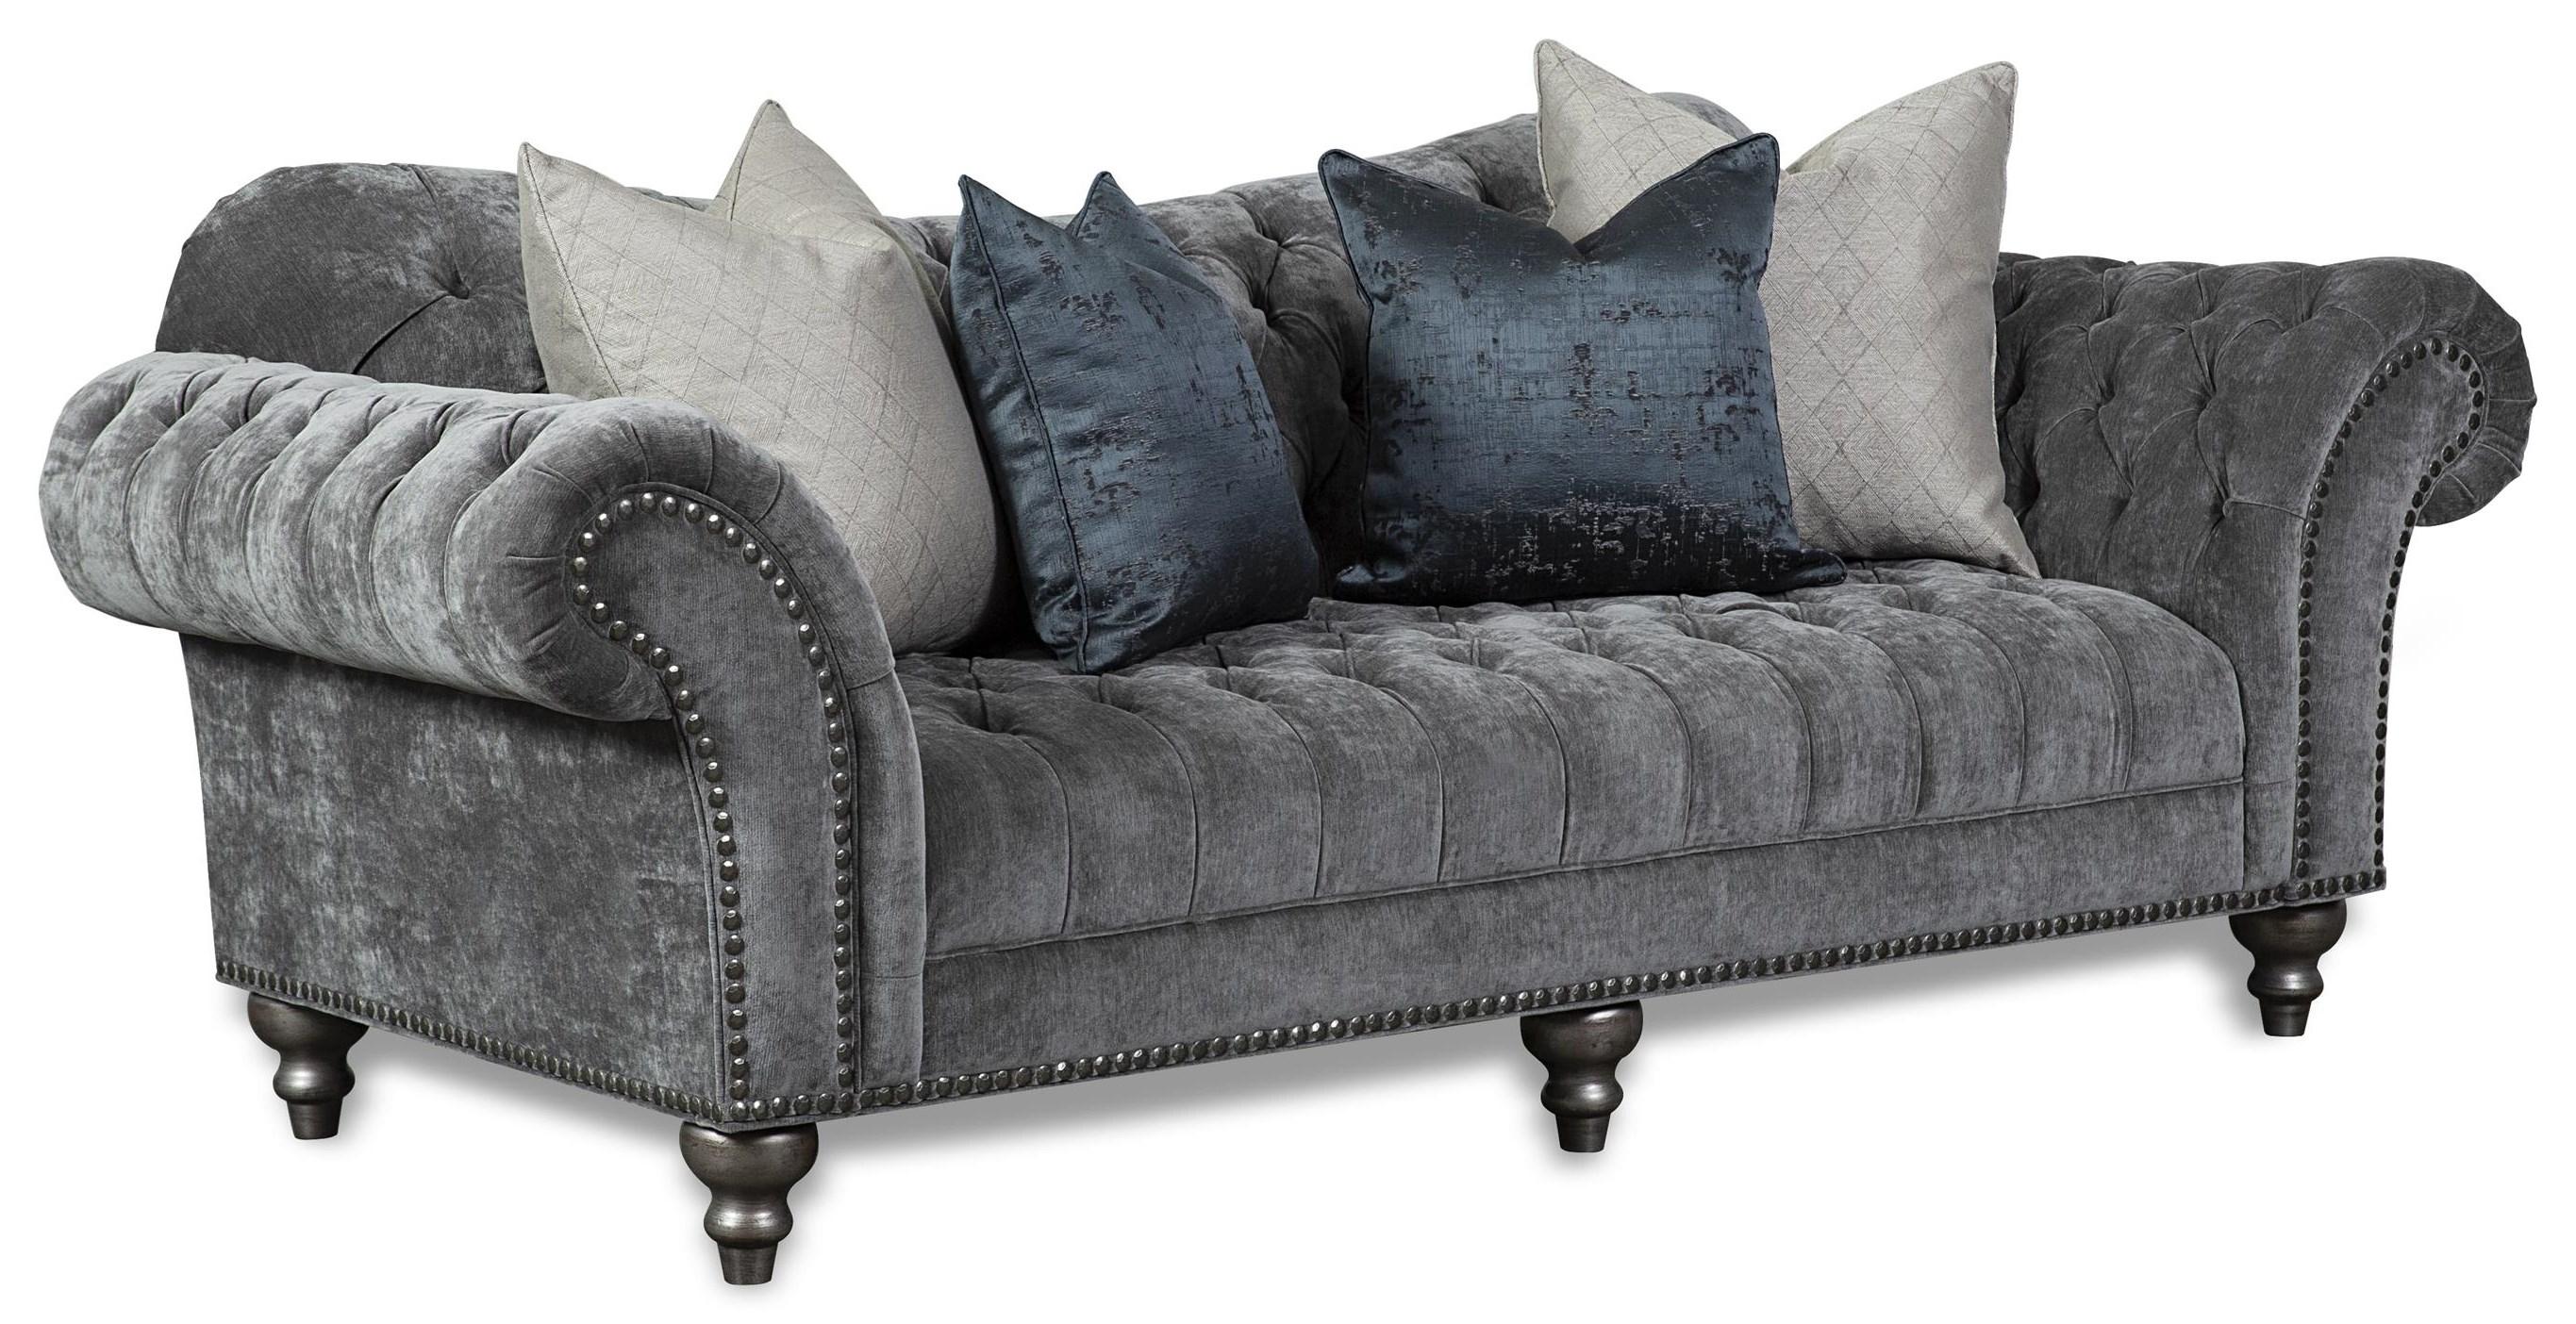 Lorraine Tufted Sofa by Aria Designs at Stoney Creek Furniture